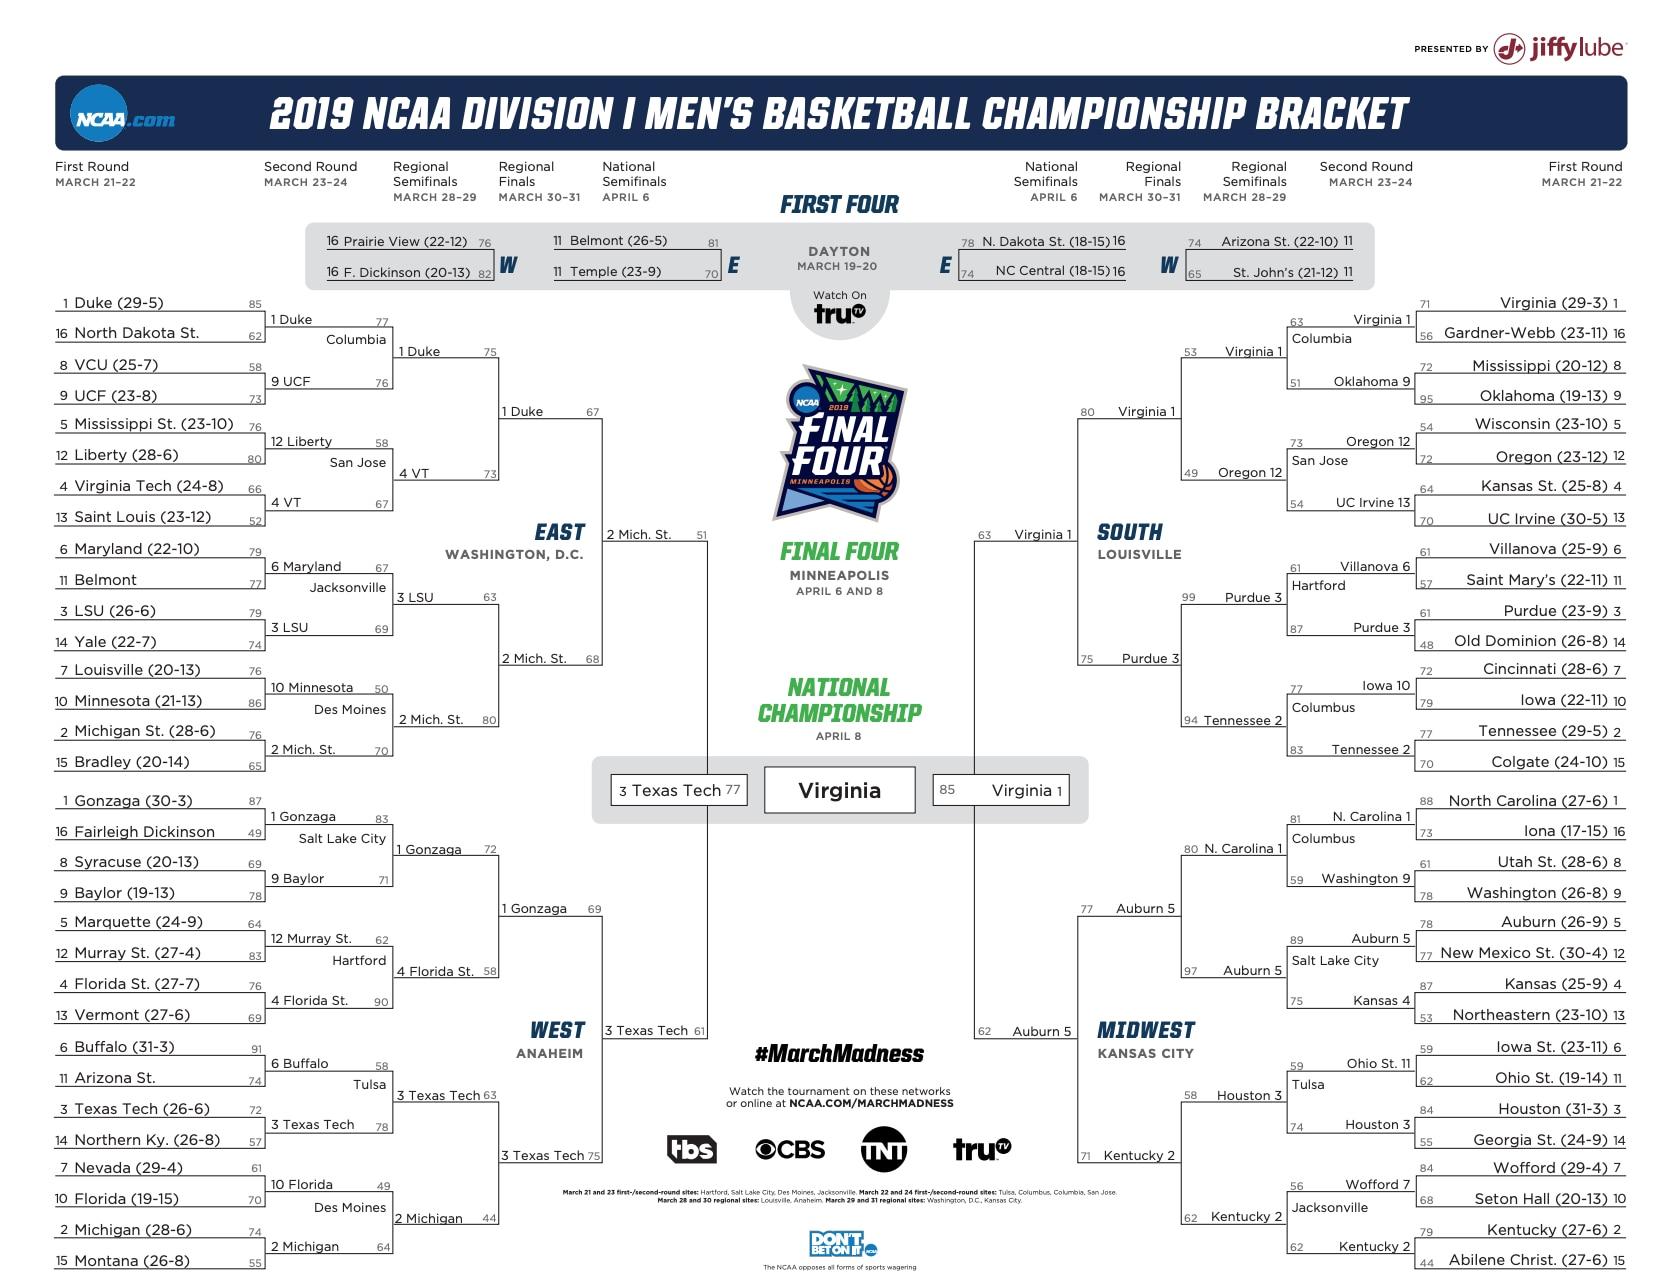 Virginia is the 2019 NCAA tournament bracket champion